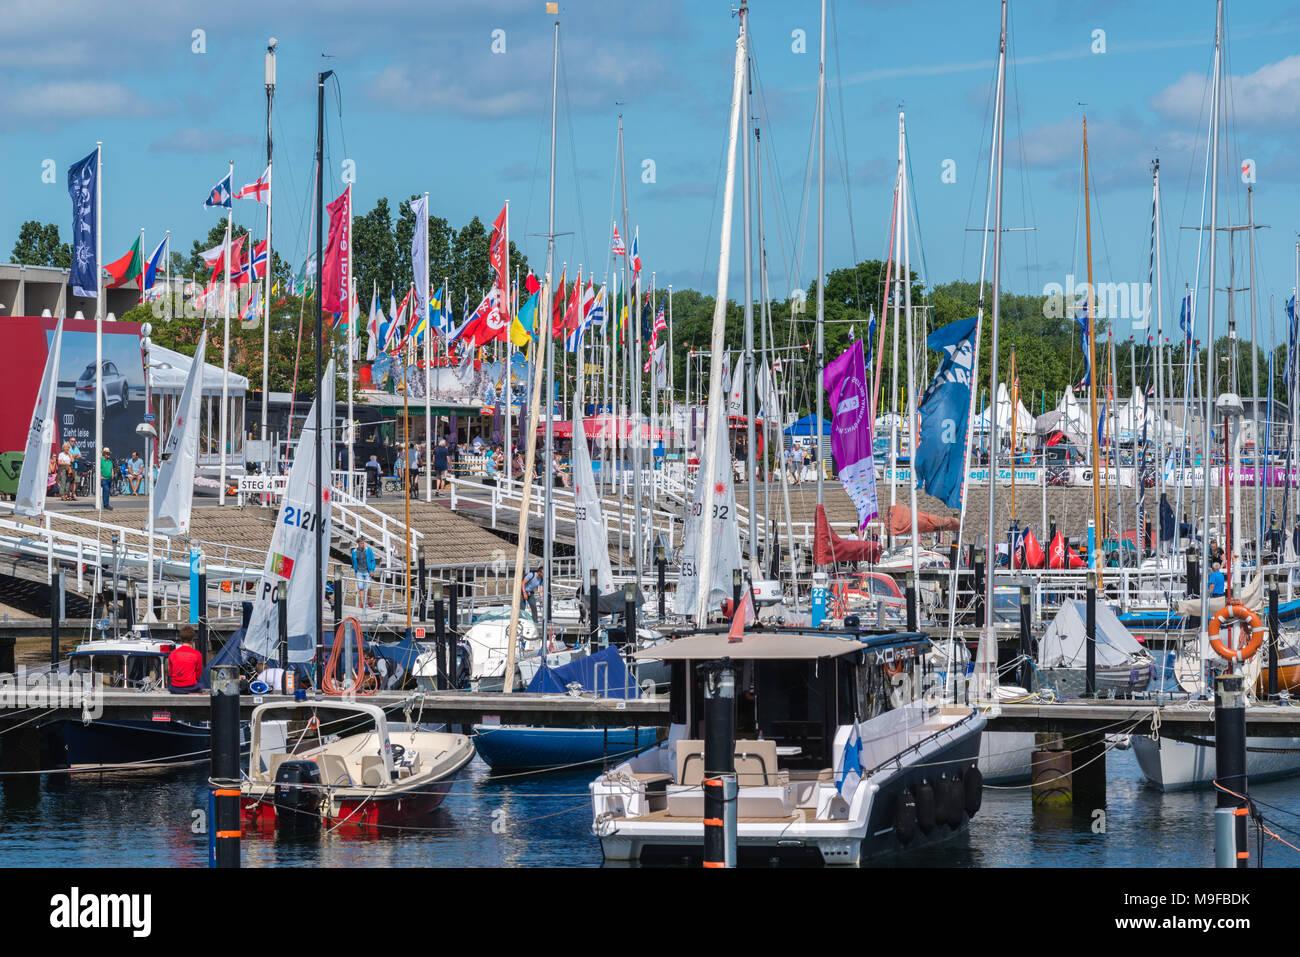 Busy marina at Kiel-Schilksee during 'Kiel Week' or 'Kieler Woche', the worldwide biggest sailing event, Kiel, Schleswig-Holstein, Germany - Stock Image